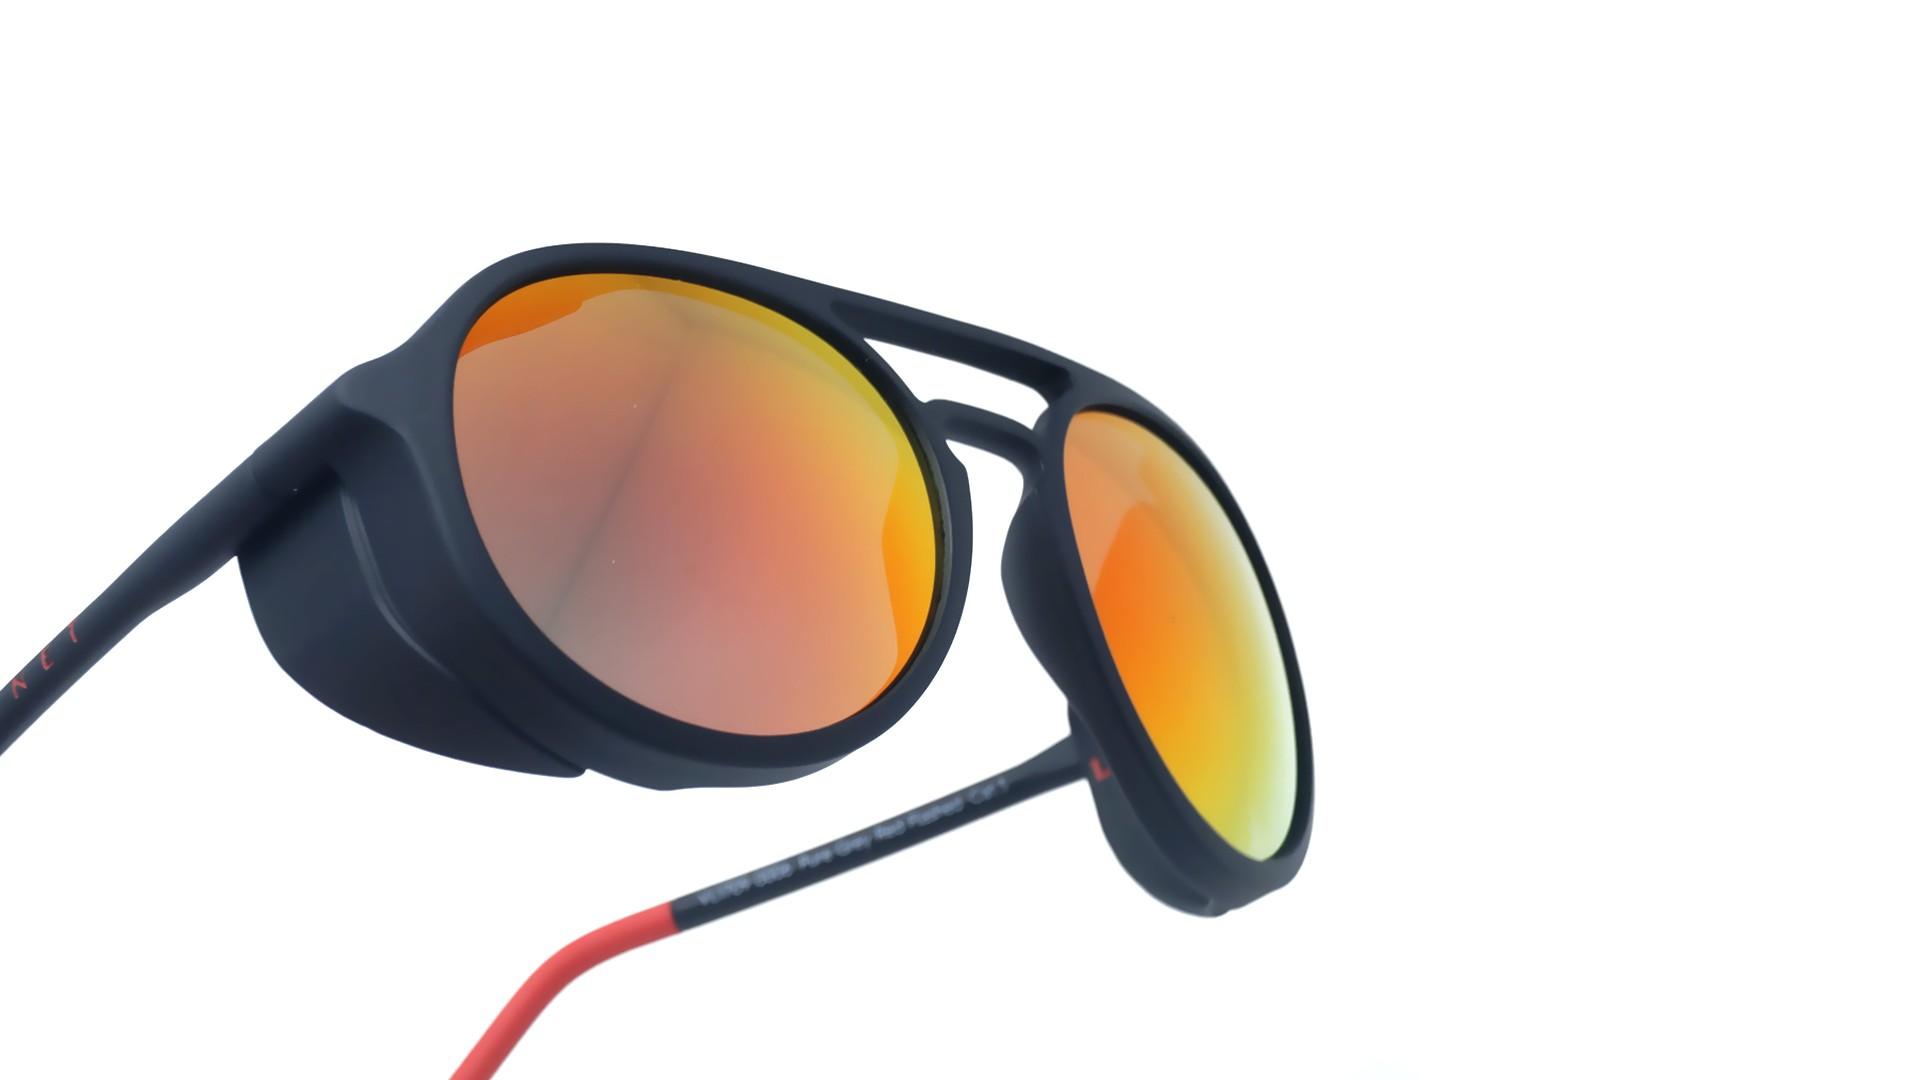 2218711cad Sunglasses Vuarnet Ice Black Mat VL1709 0006 1121 51-18 Large Flash